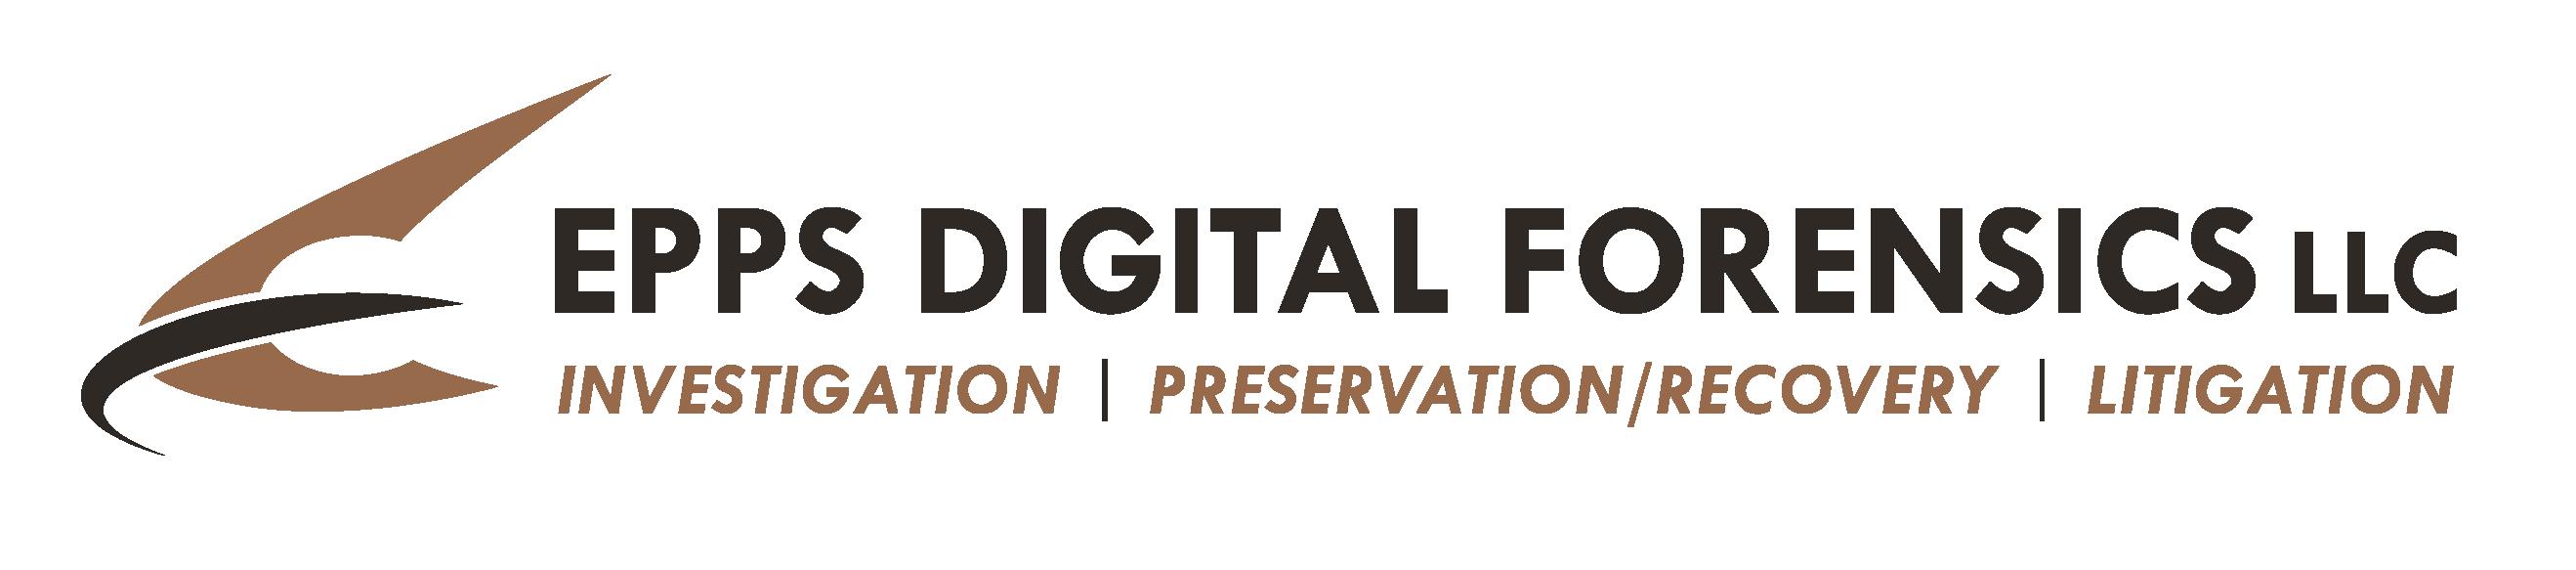 Epps Digital Forensics